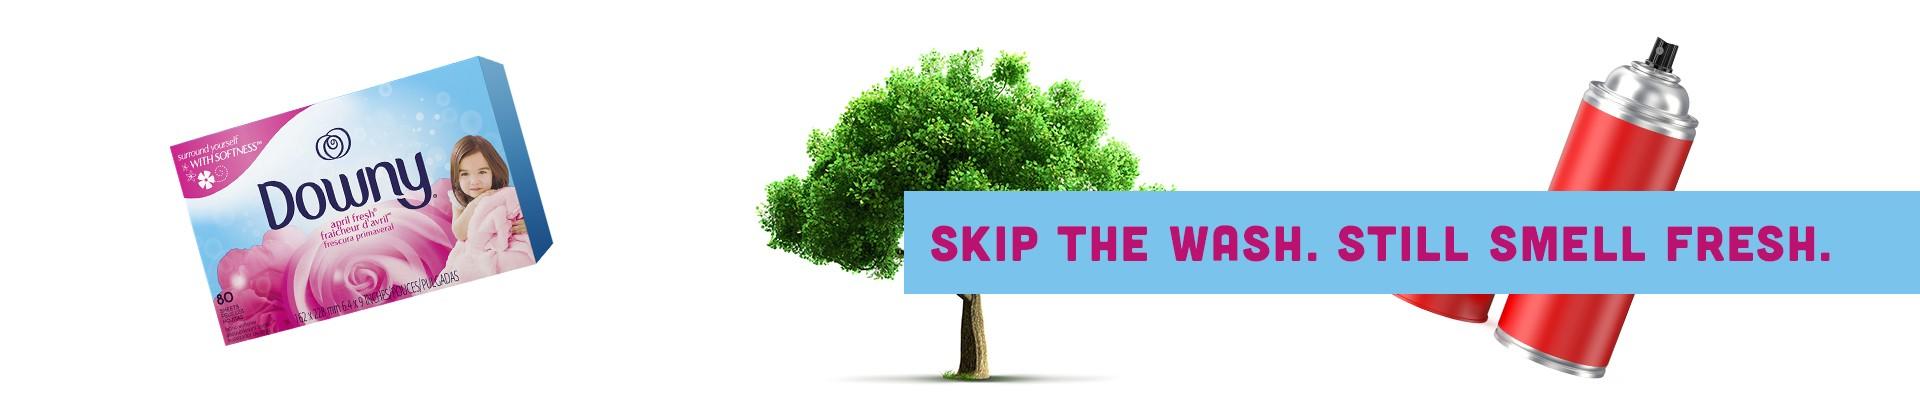 skip-the-wash-still-smell-fresh-downy-dryer-sheets-green-tree-aerosol-can